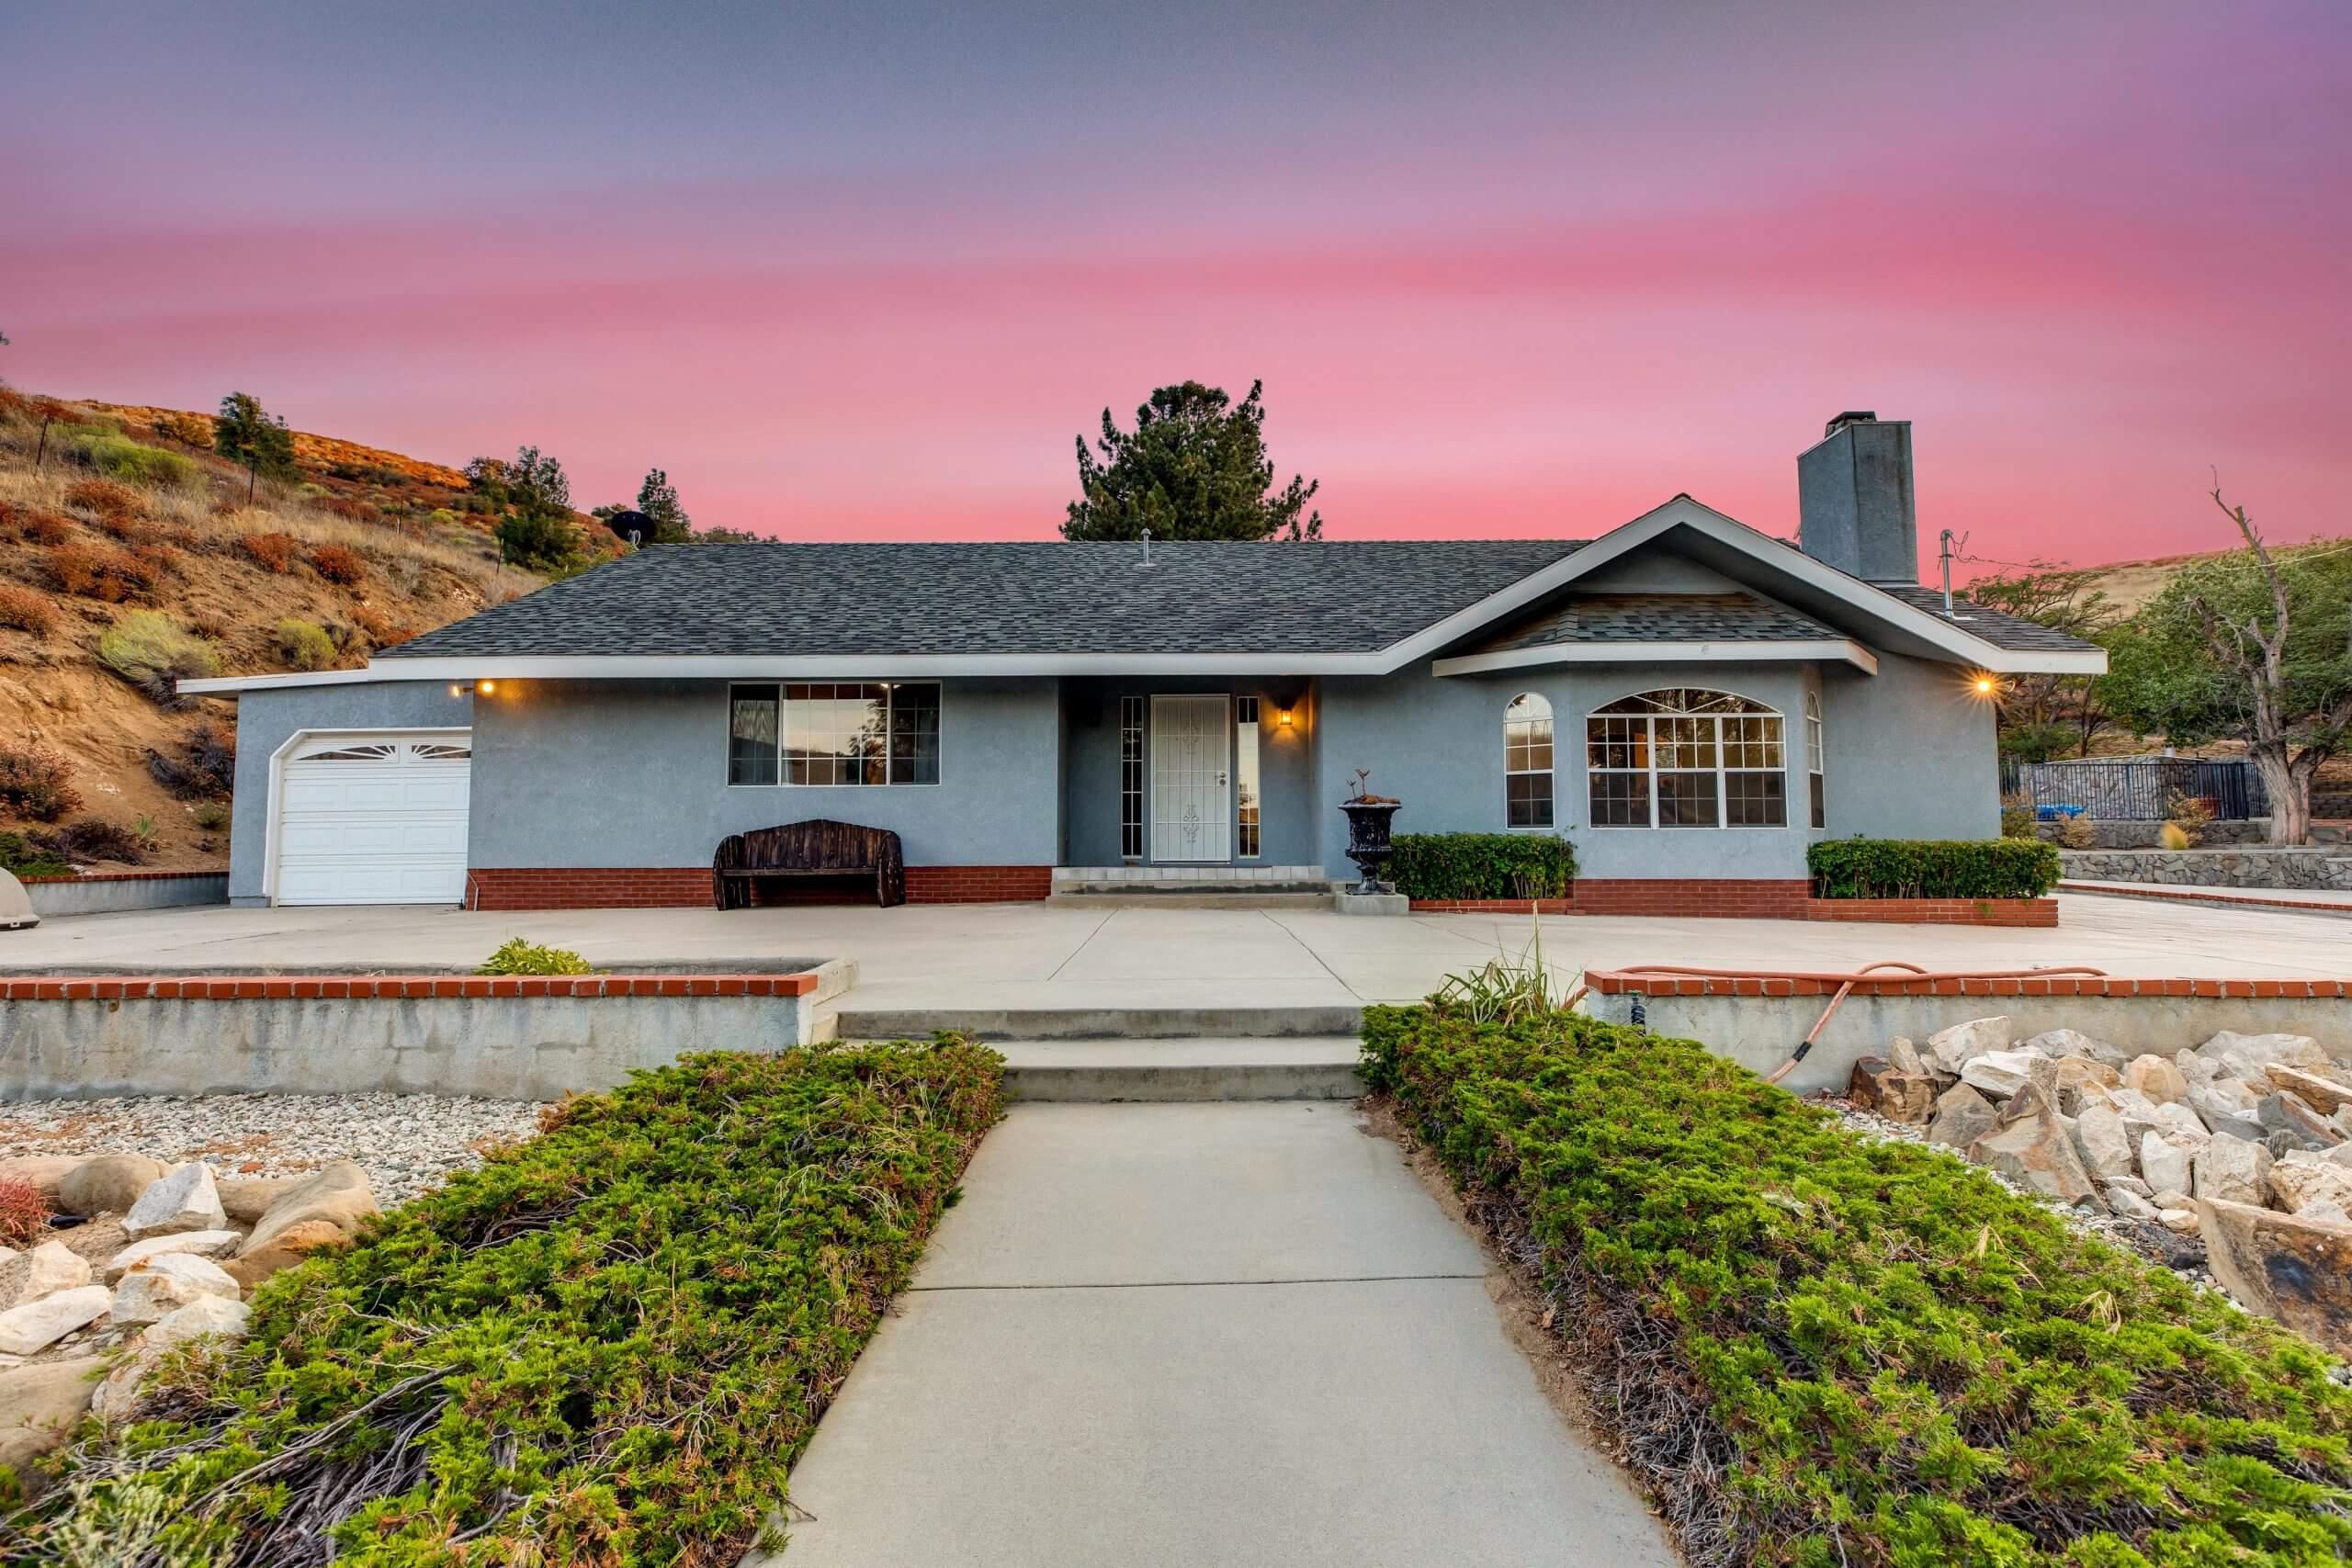 13136 Elizabeth Lake Rd. Leona Valley, CA 93551